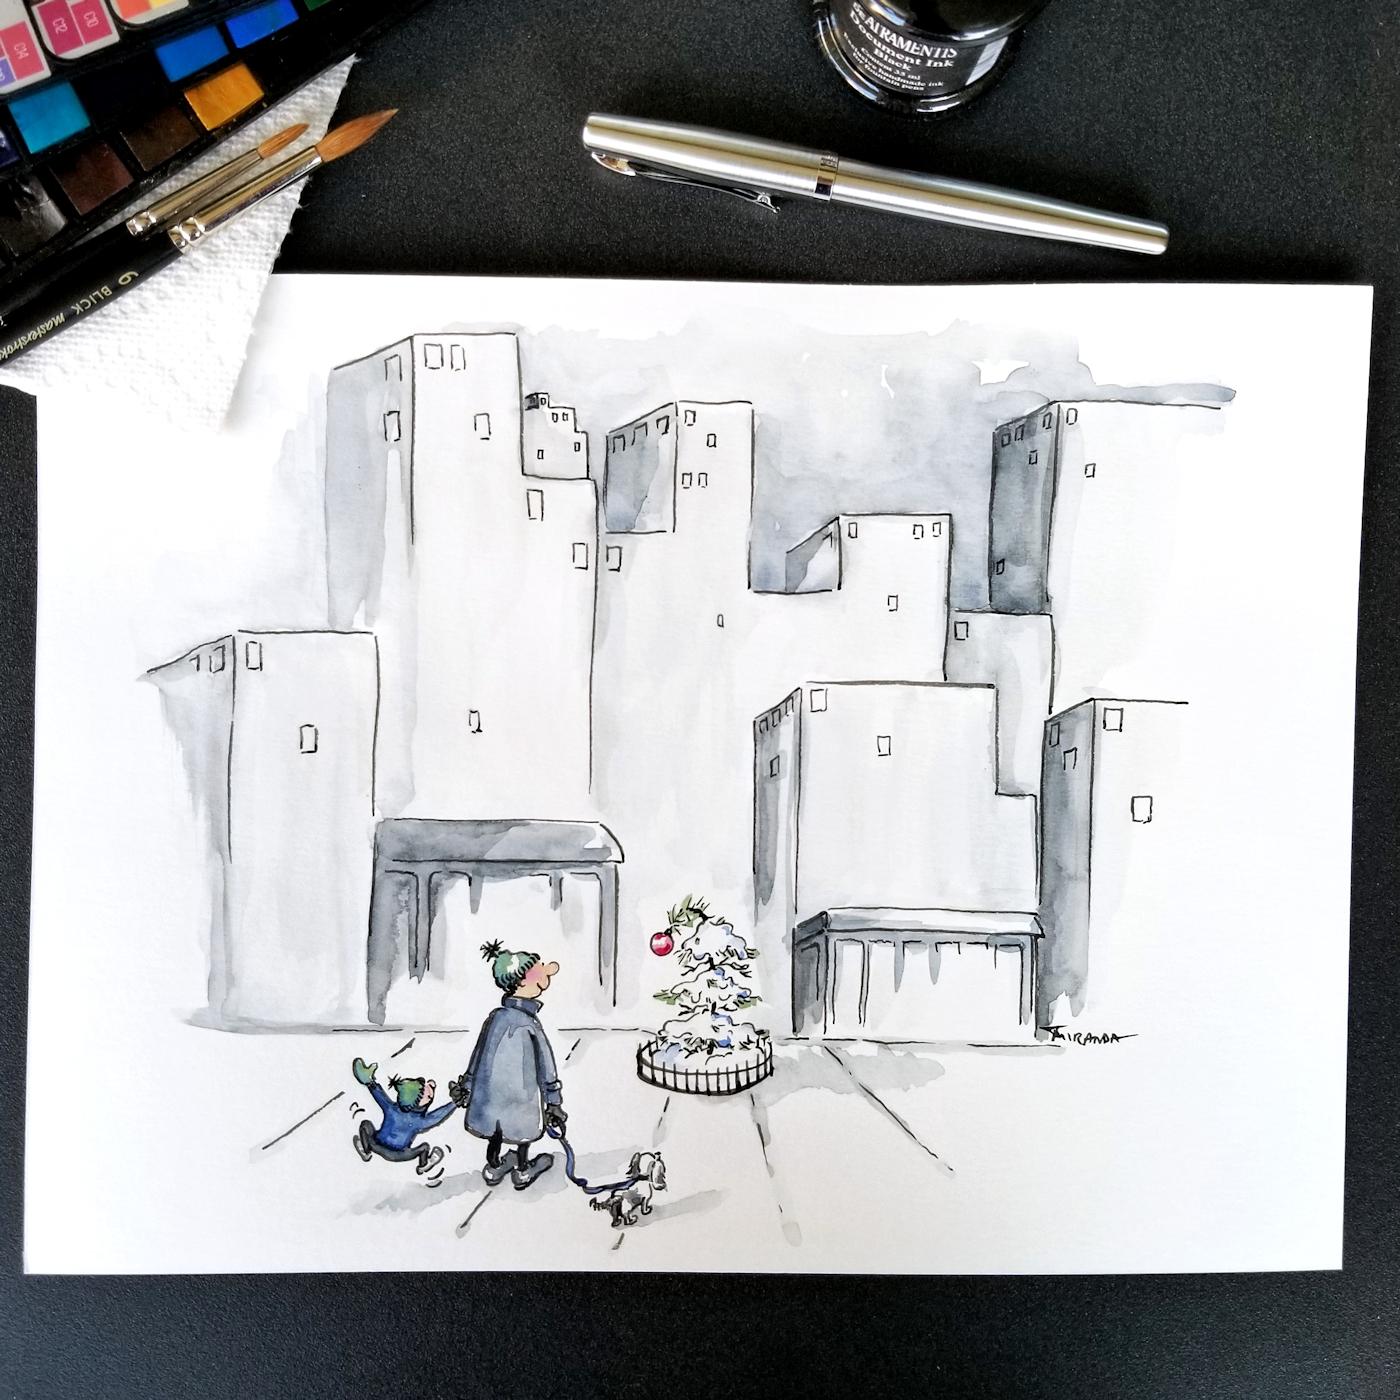 JMSC-182 Merry and Bright photo of original illustration by Joana Miranda